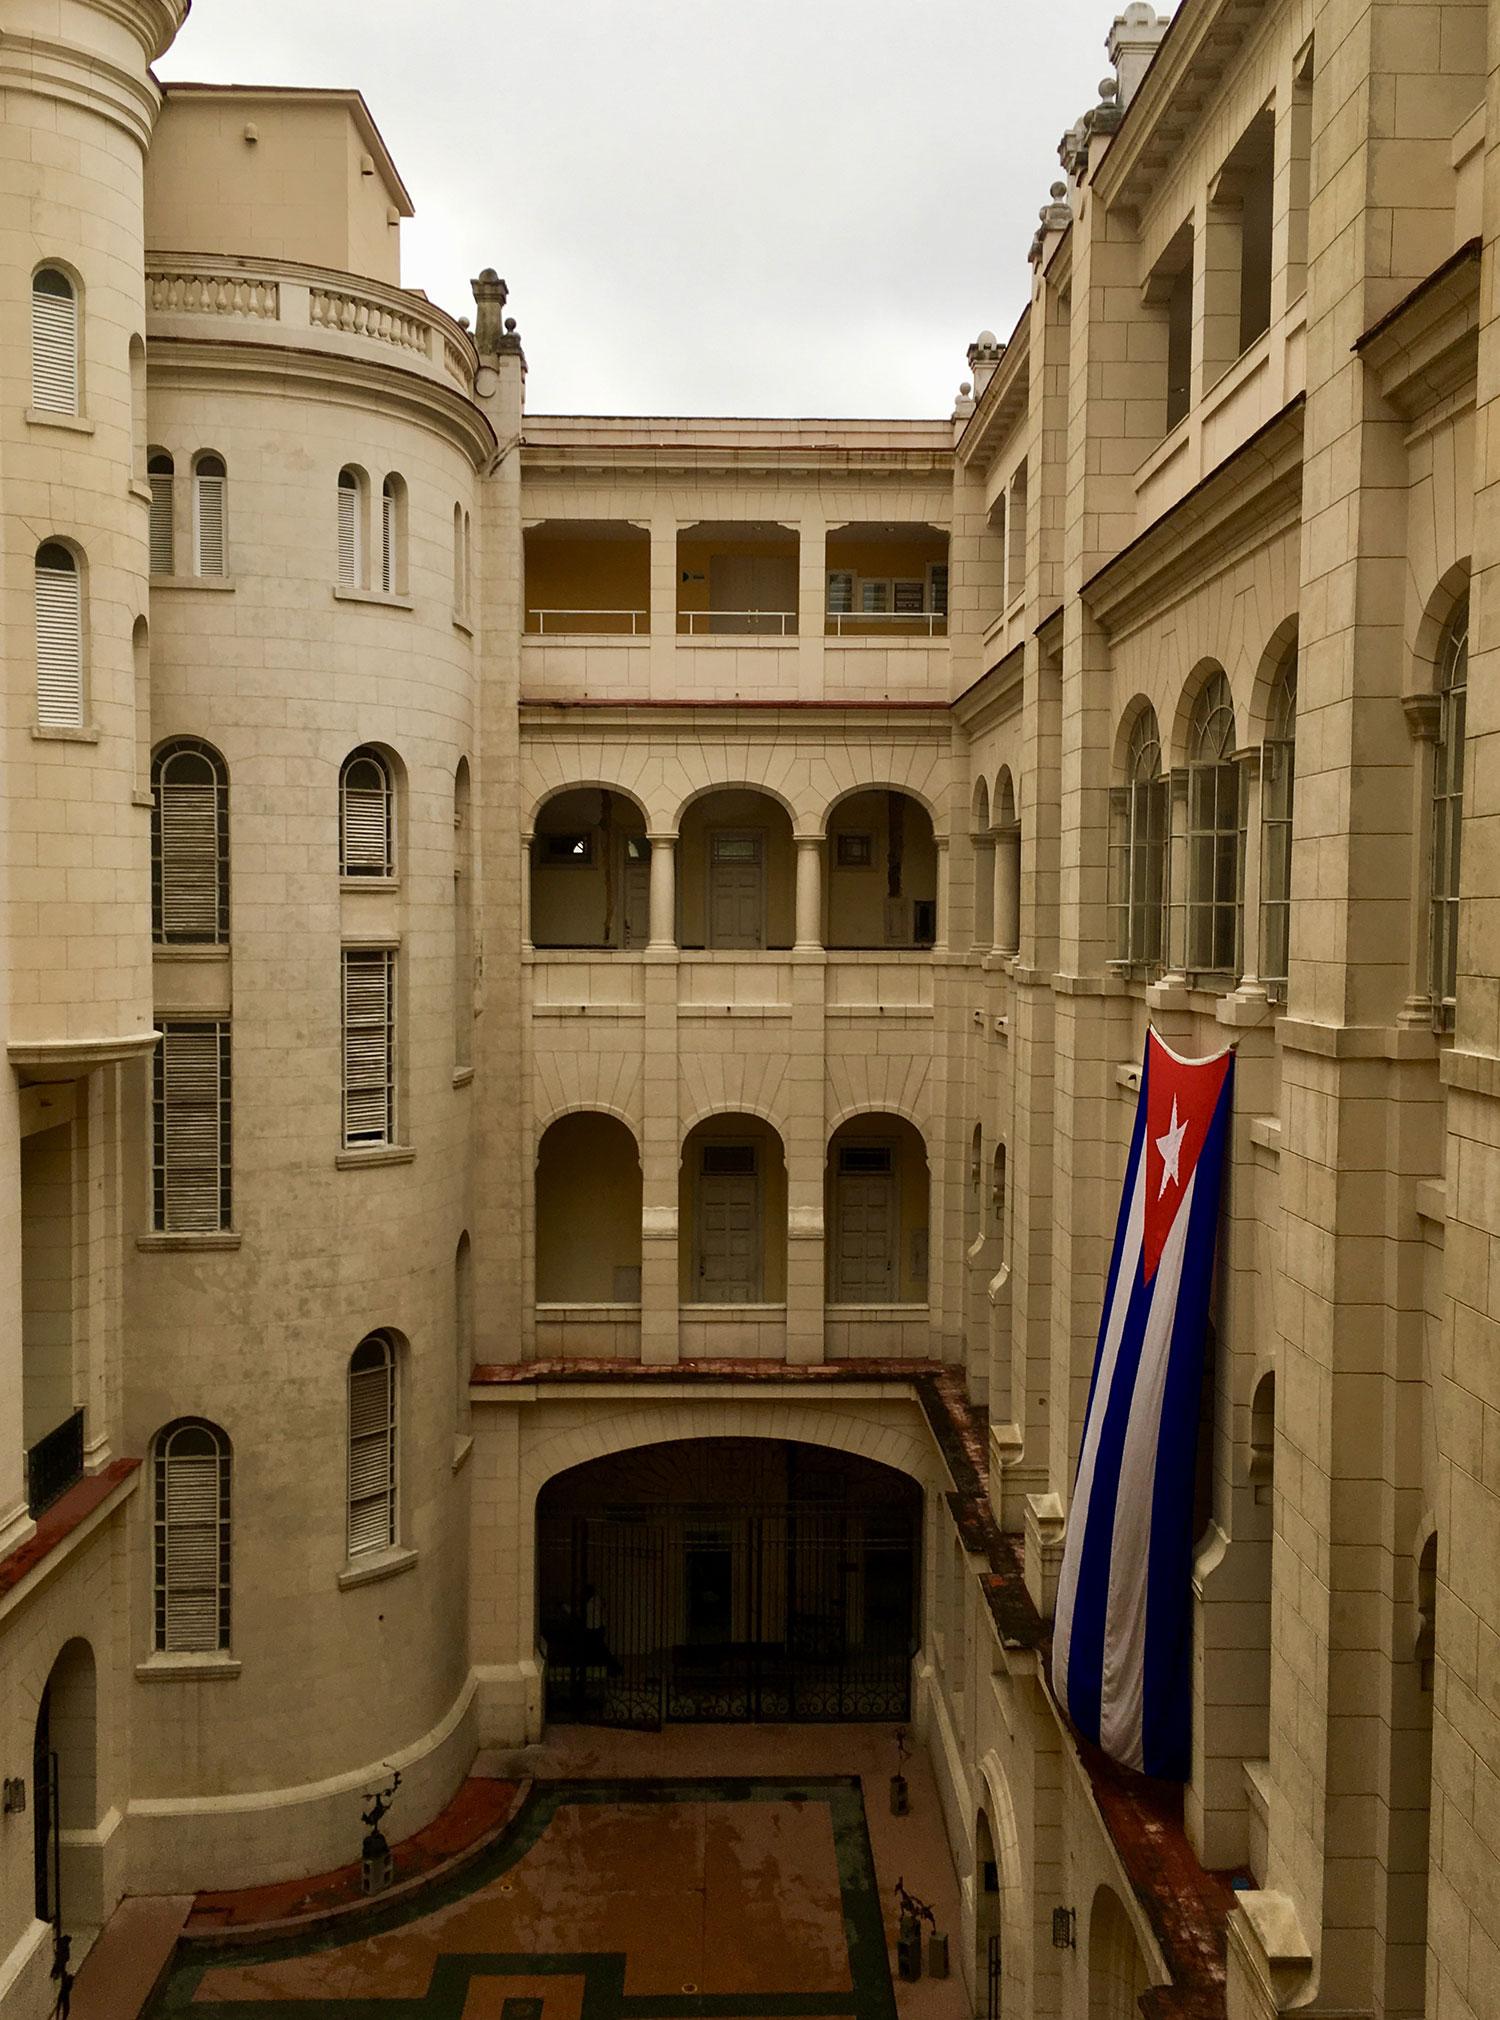 The inner courtyard.